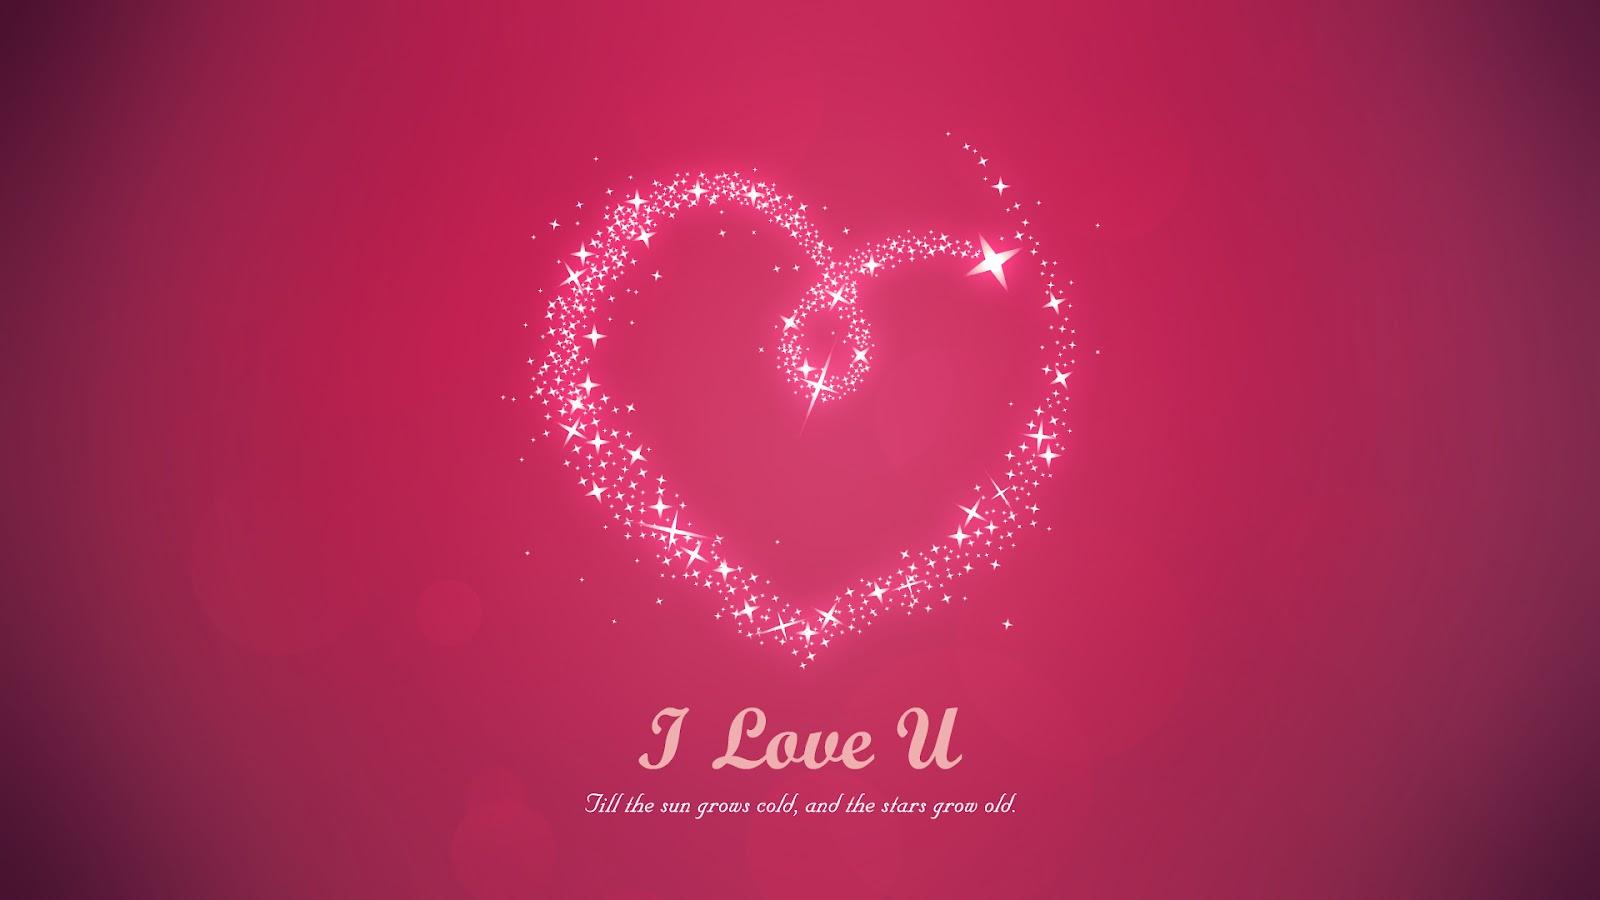 i love u wallpapers | love wallpapers | love quotes wallpapers | sad love wallpapers | sad ...